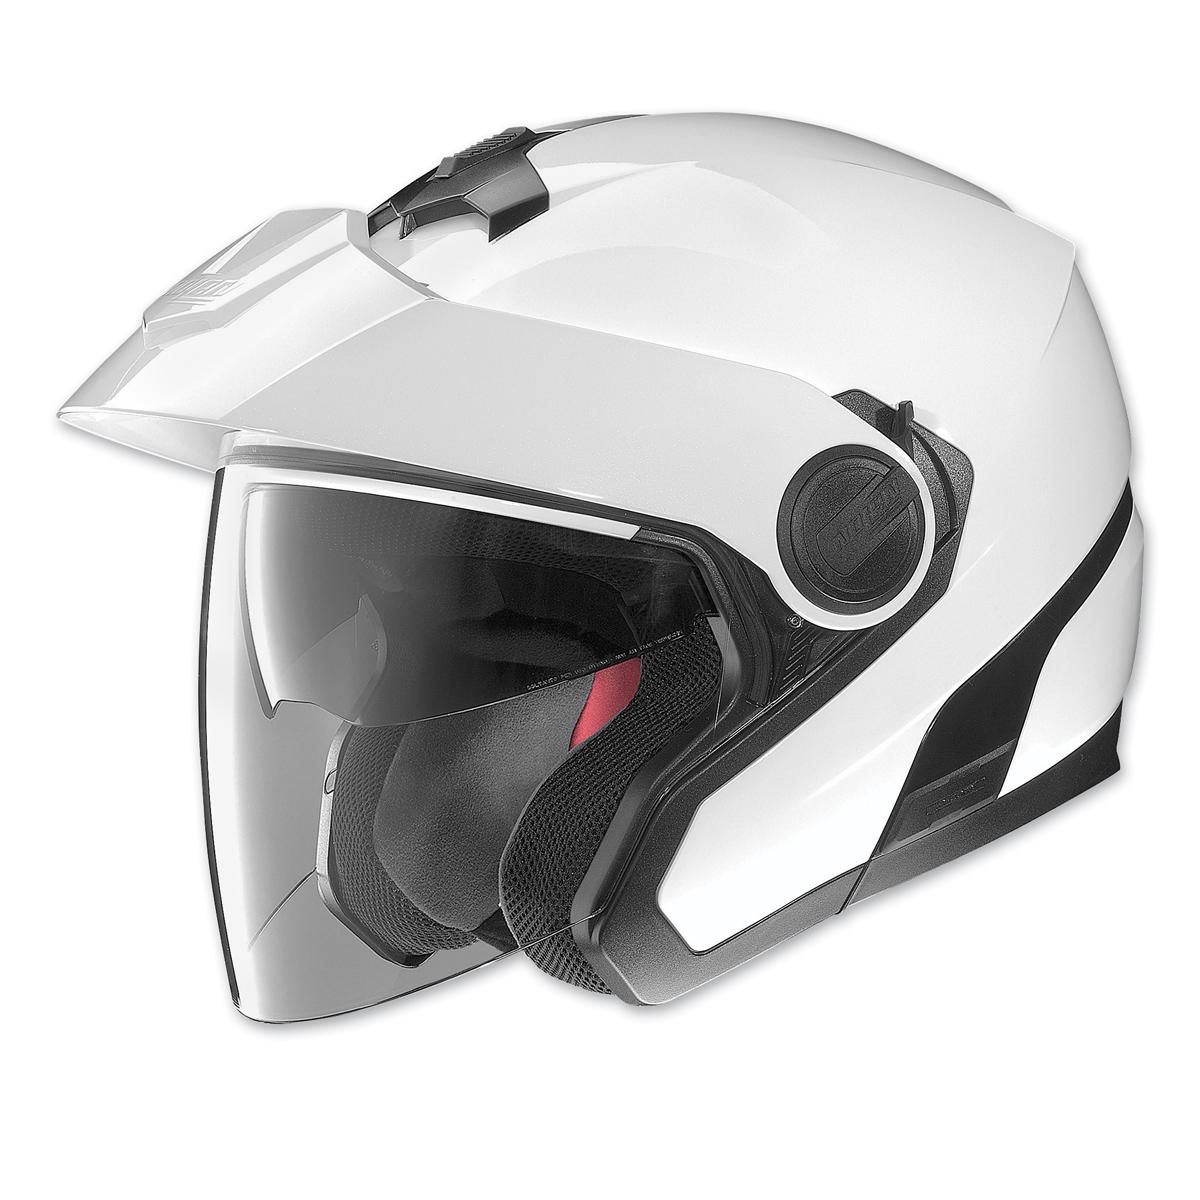 Nolan N40 Metallic White Open Face Helmet